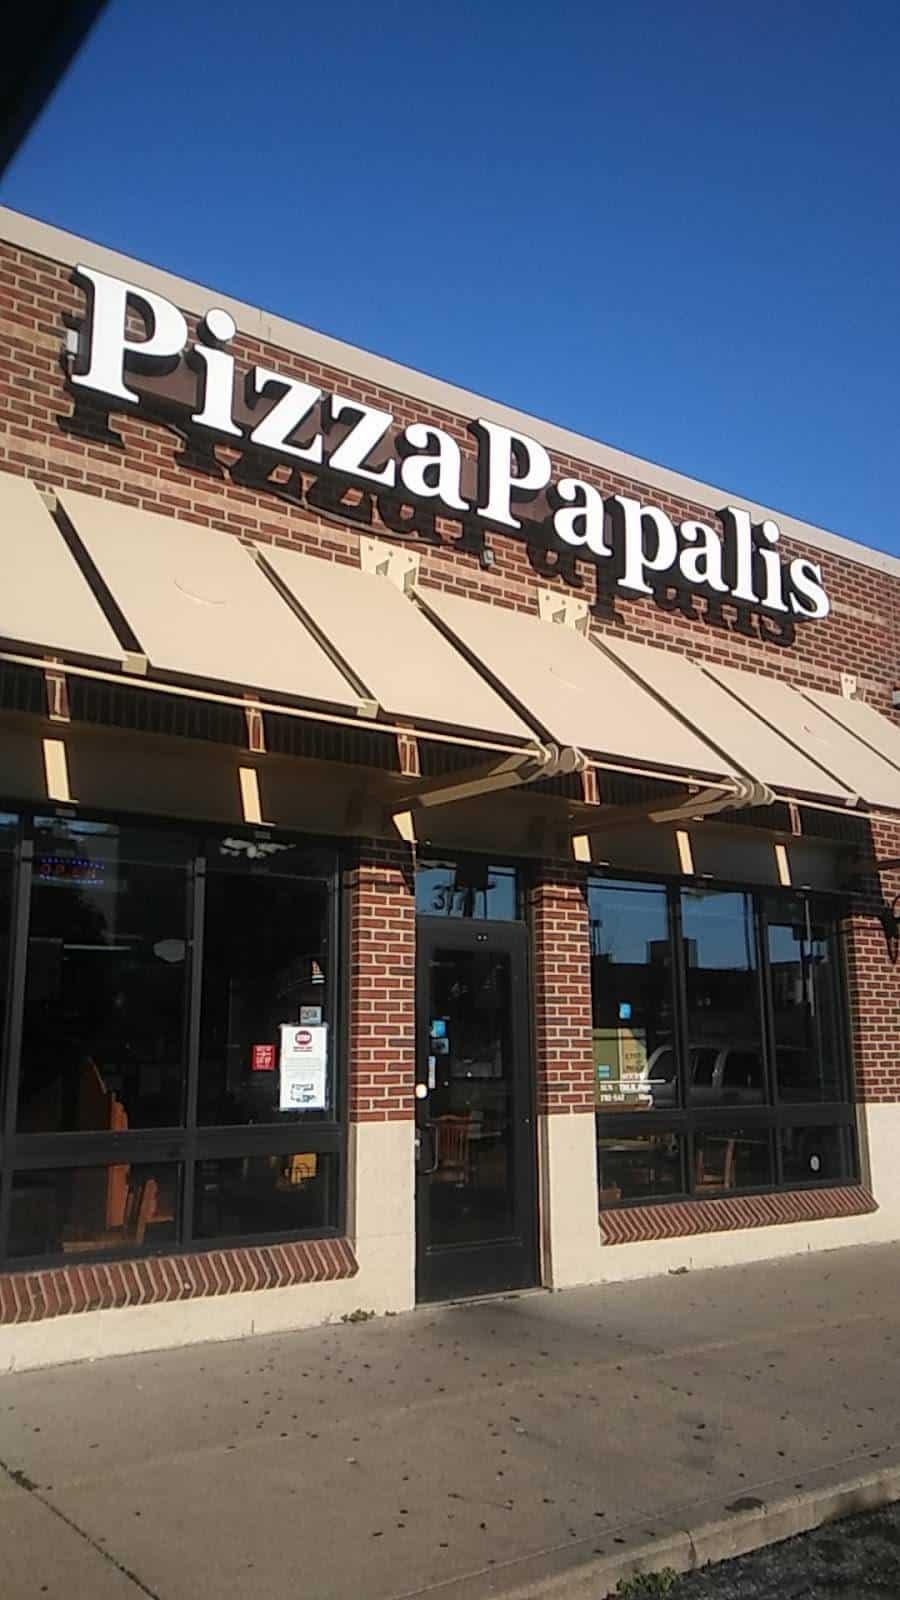 PizzaPapalis